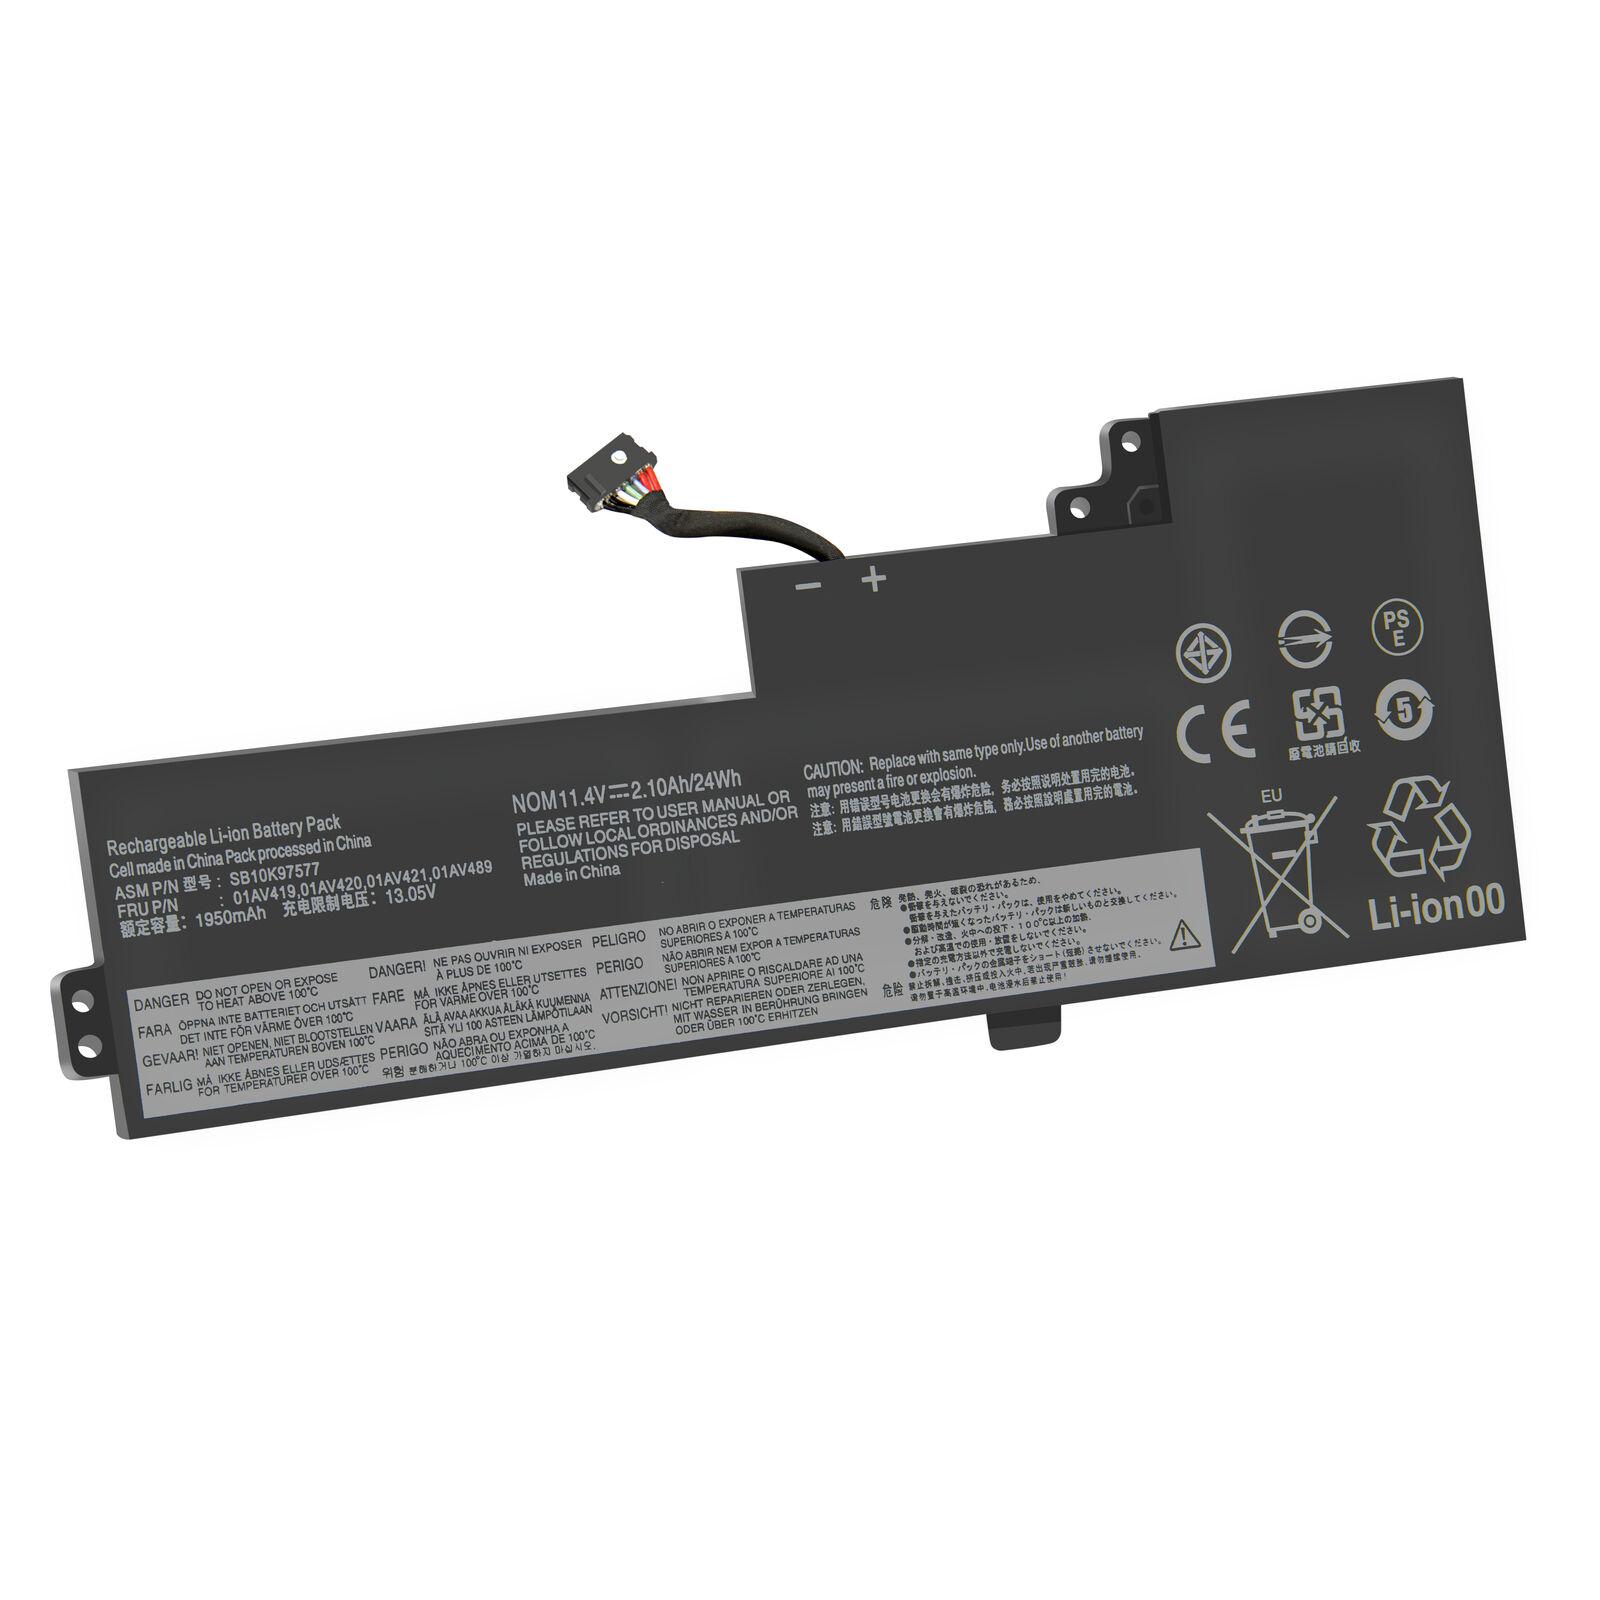 Batterie pour 11.4V 2.1Ah 01AV421 01AV420 SB10K97578 01AV489 01AV419 Lenovo T470 T480(compatible)